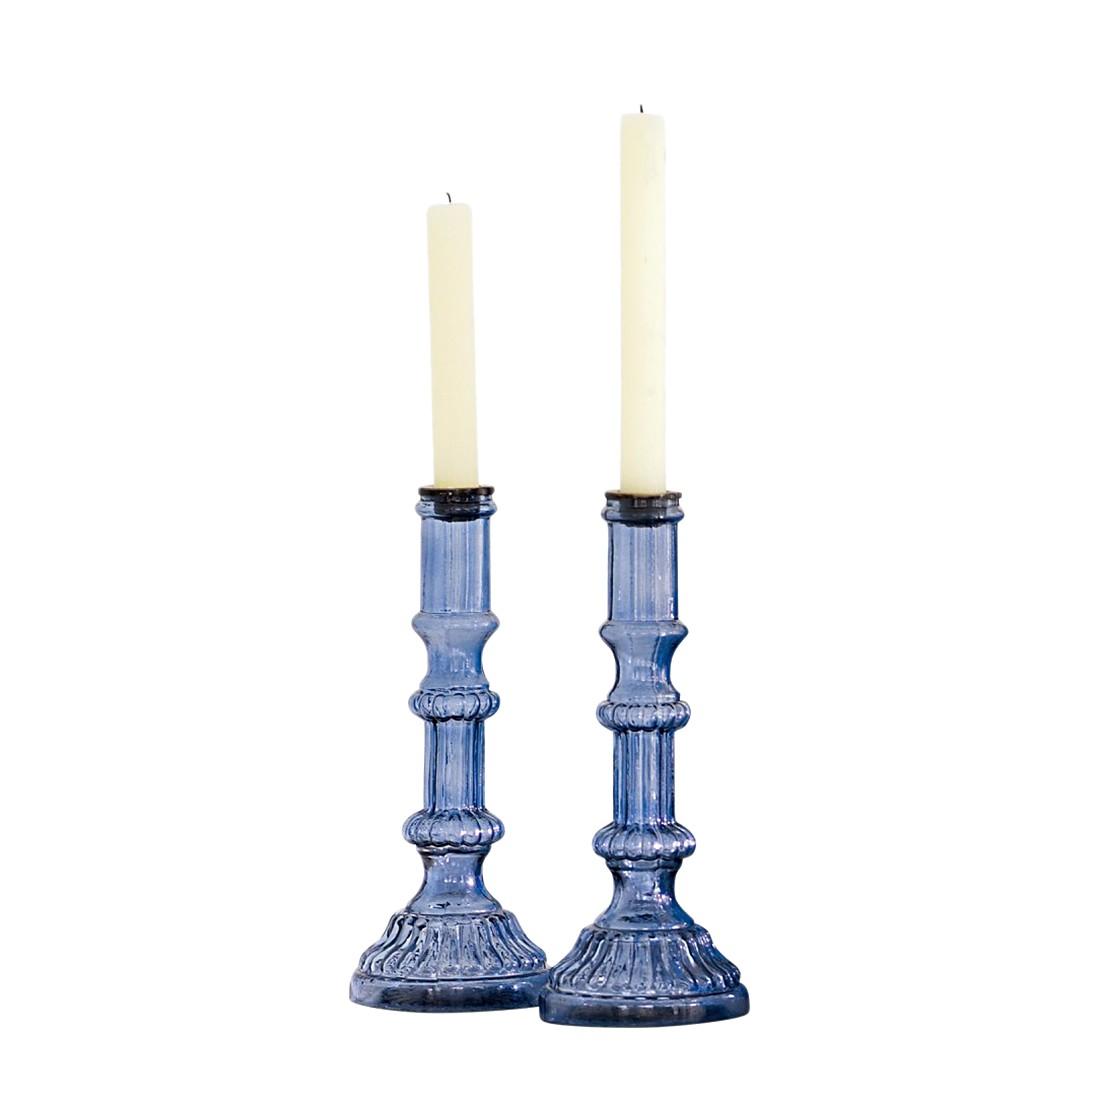 Kerzenständer 2er Set Soho – Glas blau, Loberon günstig bestellen